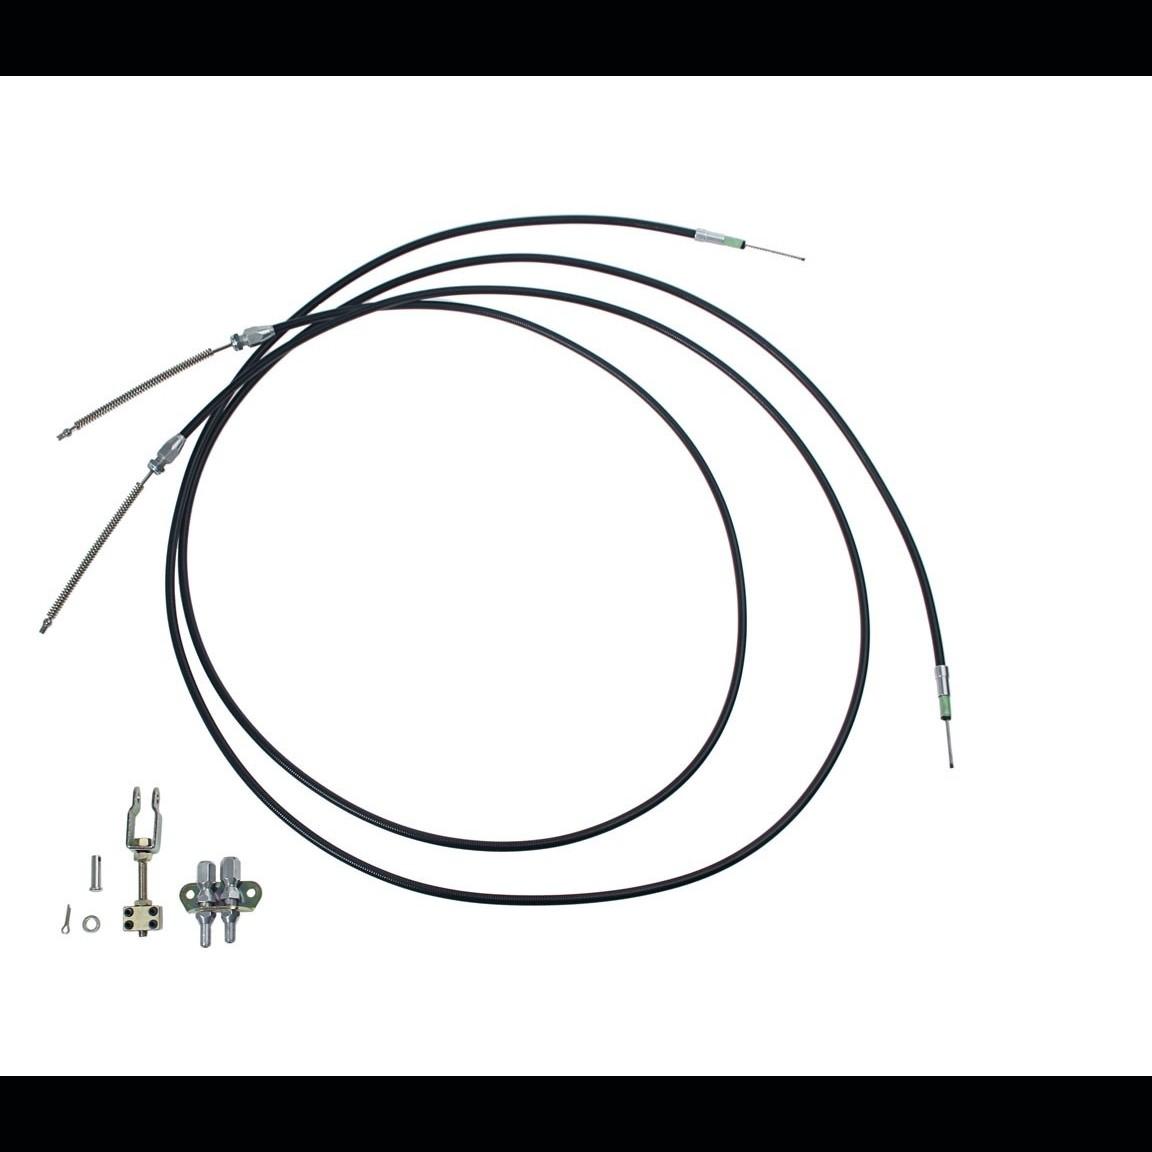 audi a6 c6 brake light wiring diagram ford 3000 tractor starter solenoid corvette transmission harness